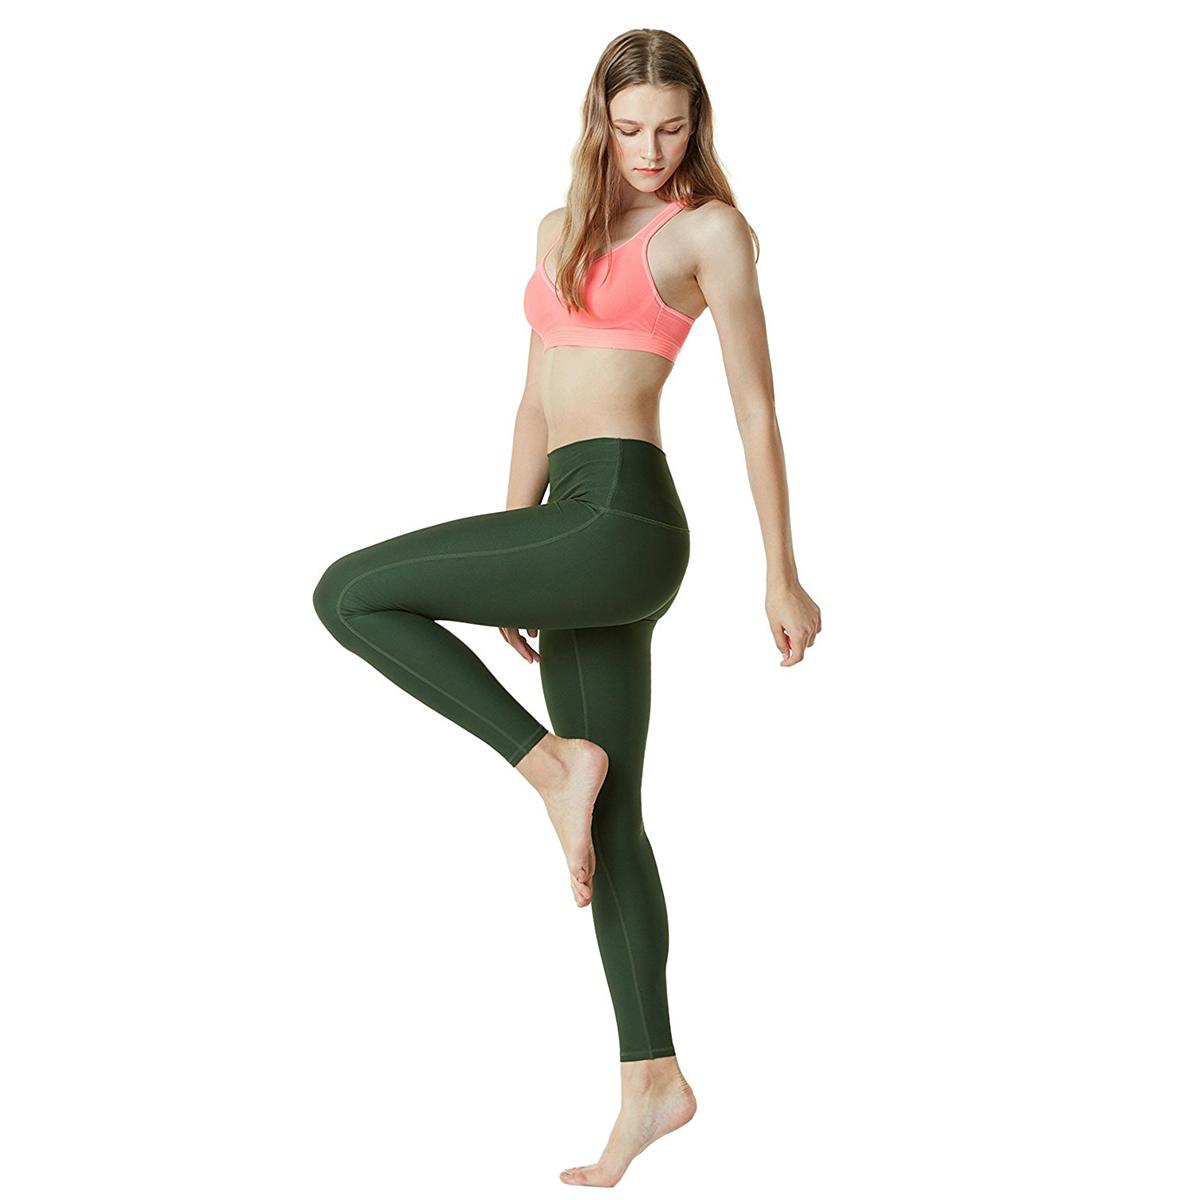 thumbnail 57 - TSLA Tesla FYP42 Women's High-Waisted Ultra-Stretch Tummy Control Yoga Pants